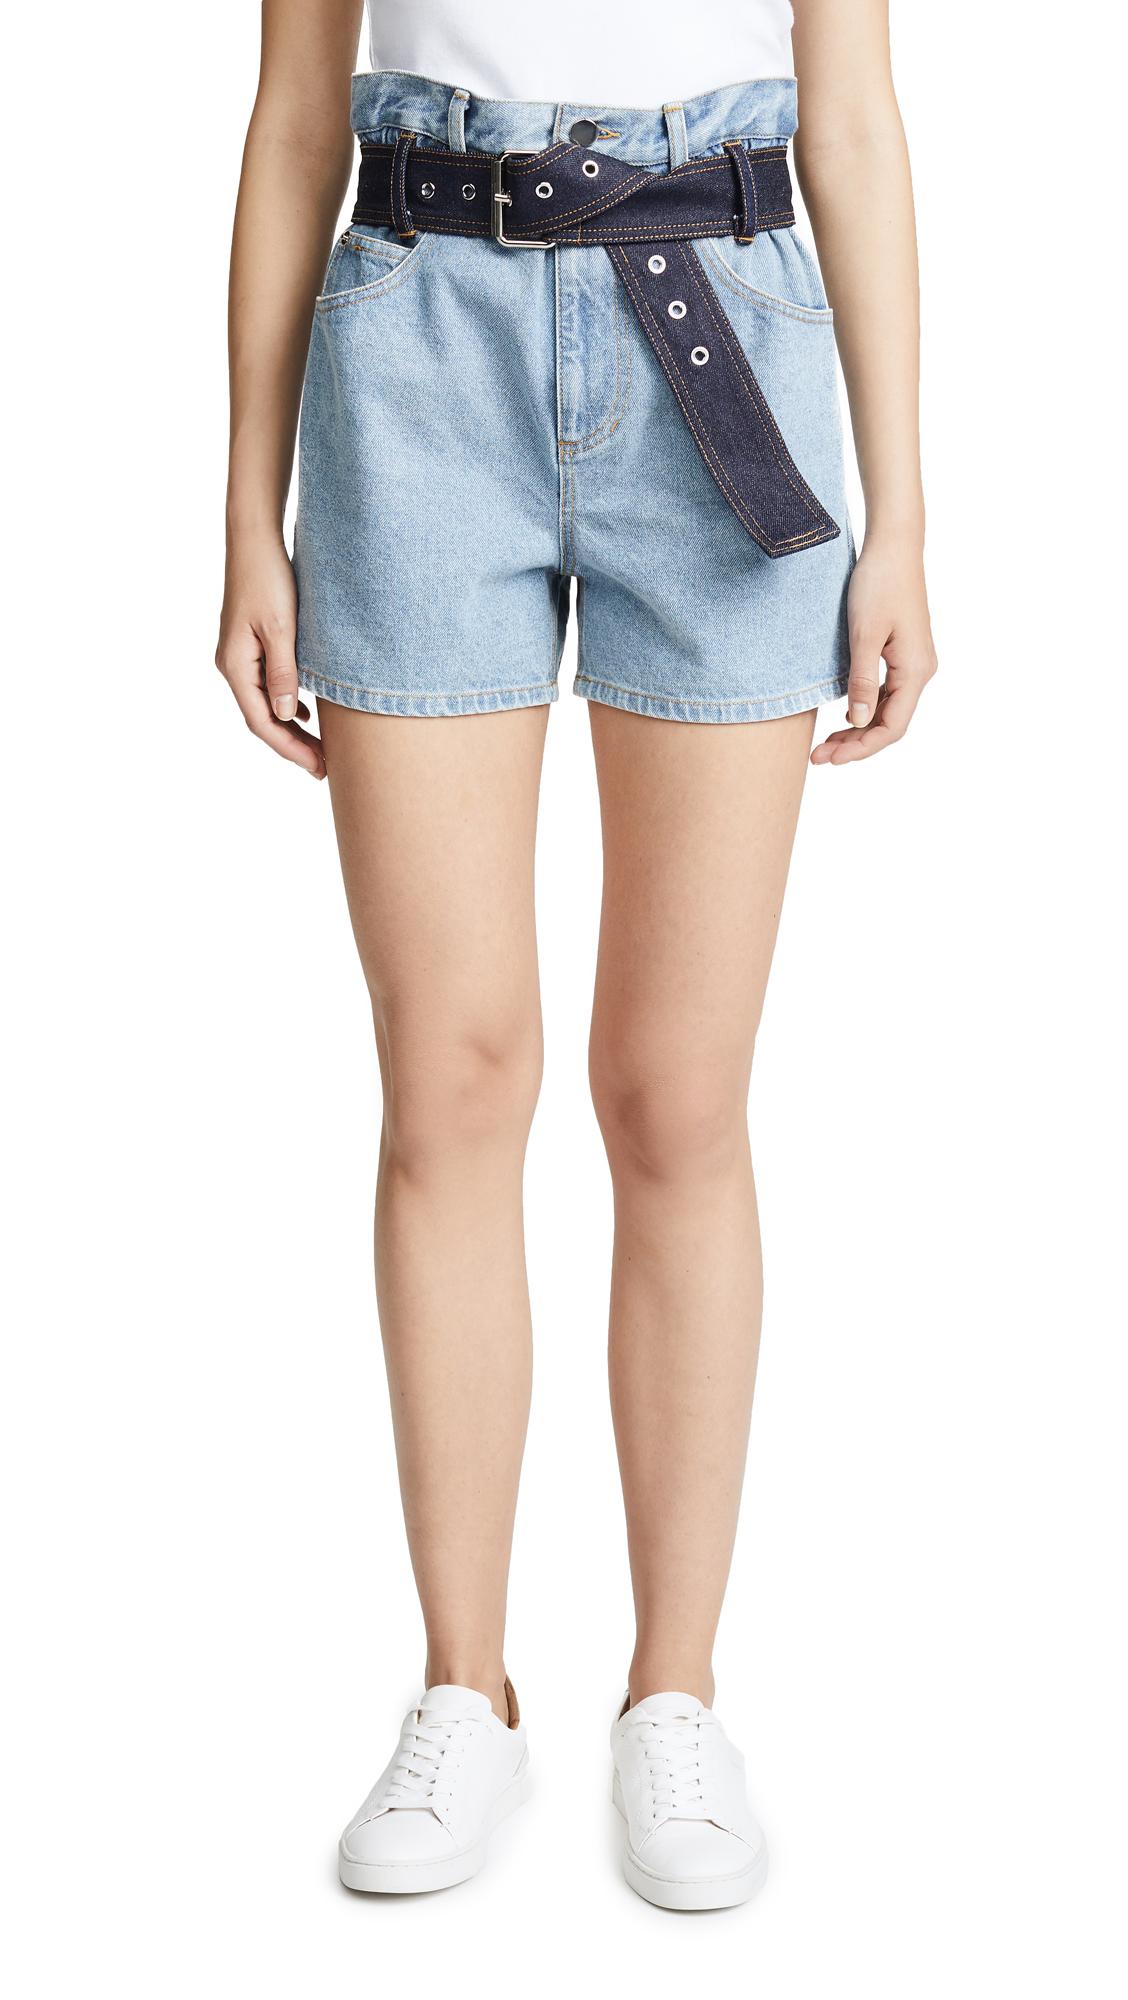 3.1 Phillip Lim Belted Paperbag Shorts - Indigo